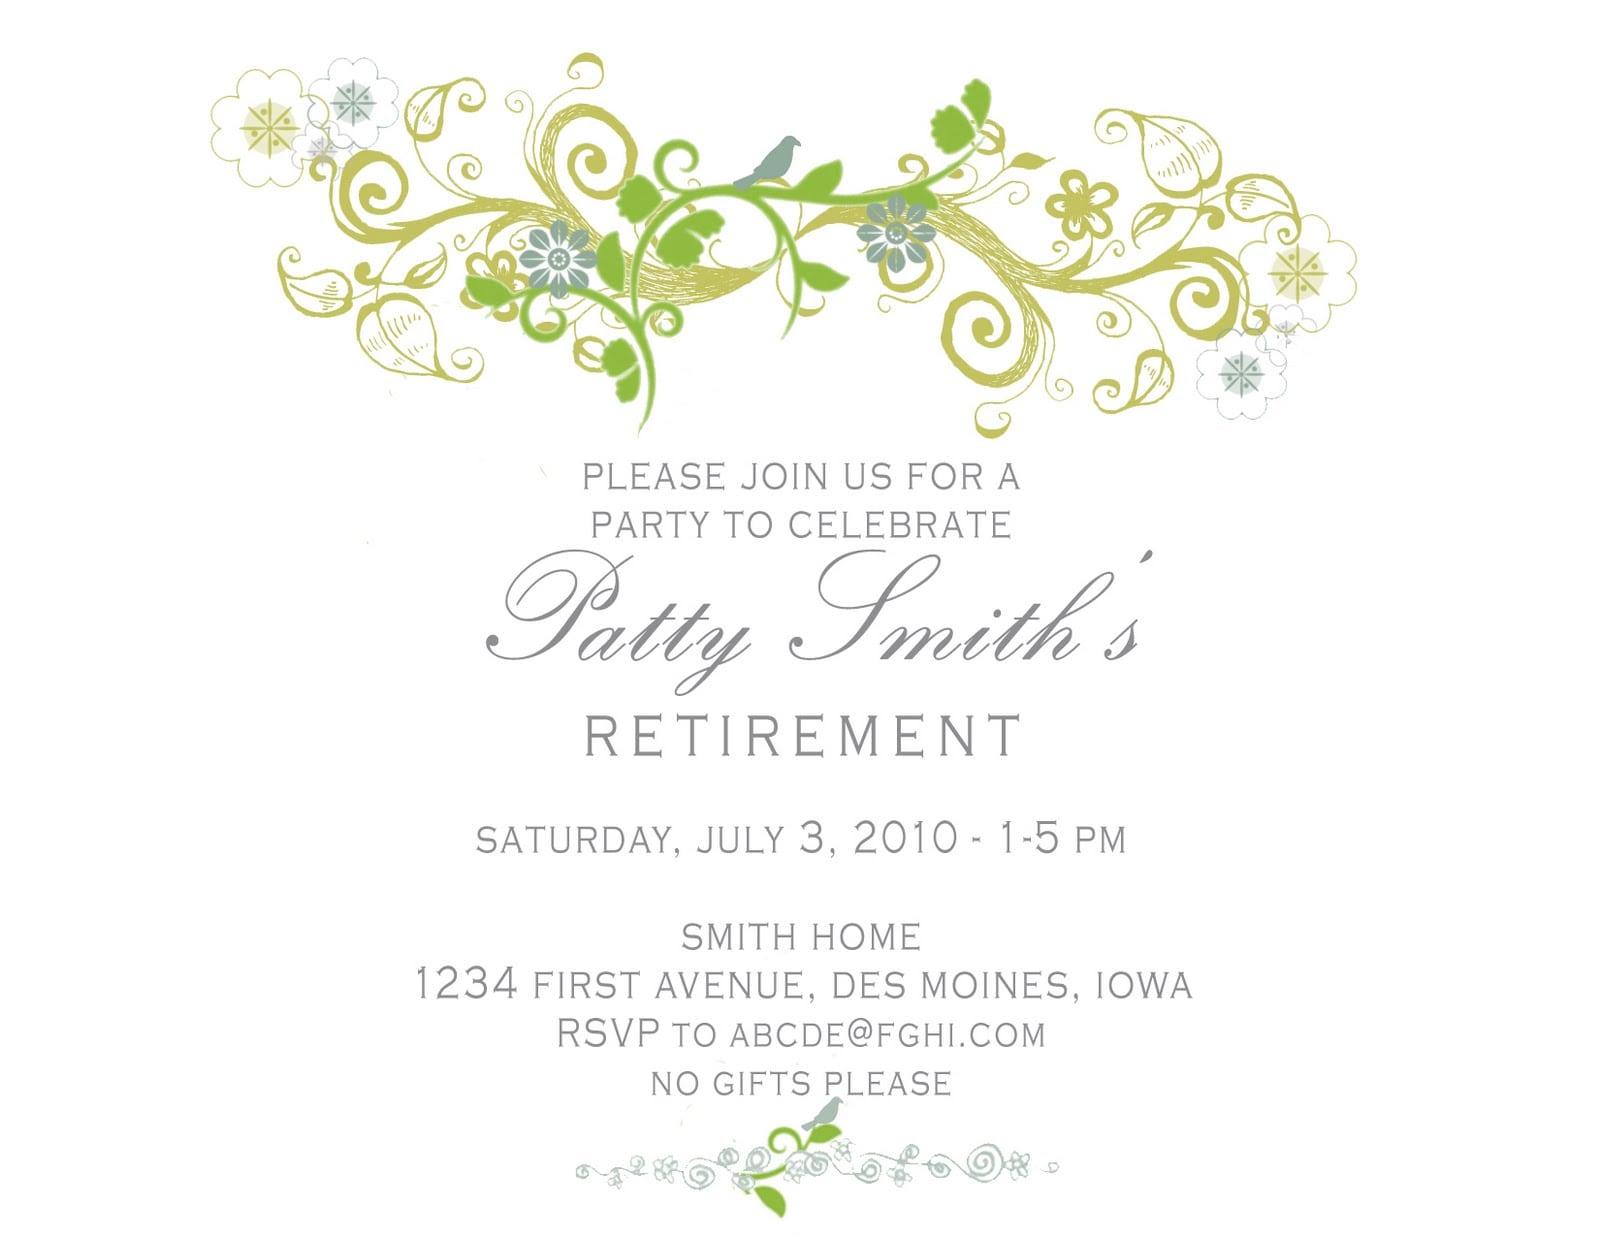 Retirement Invitation Card Template